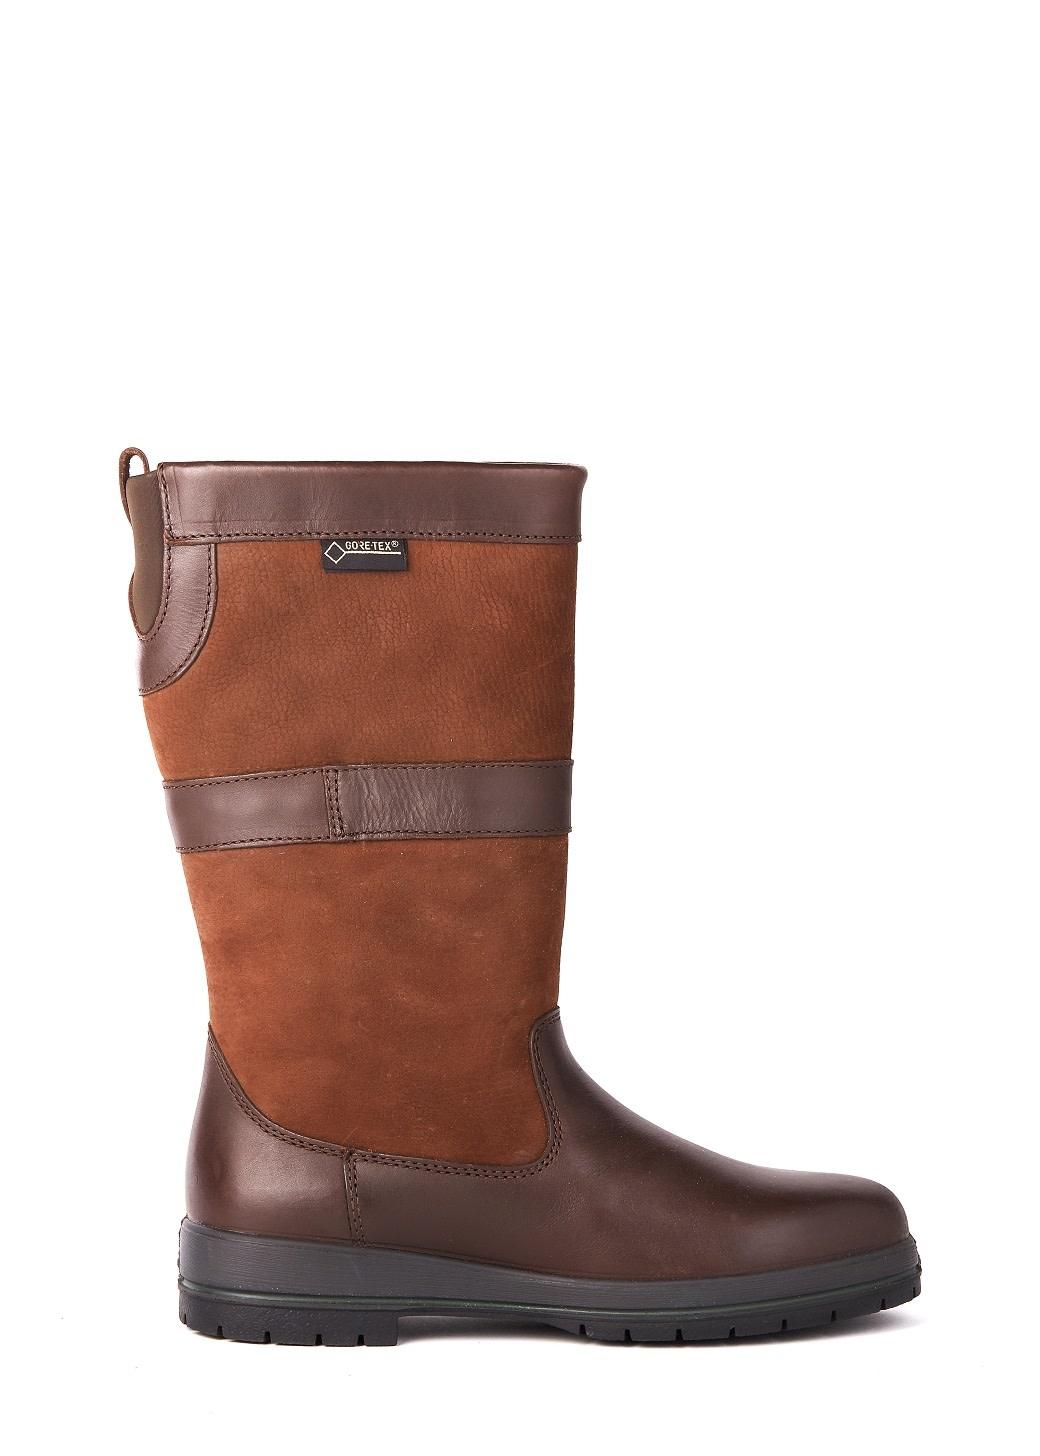 Dubarry Kildare outdoor laarzen - Walnut-5